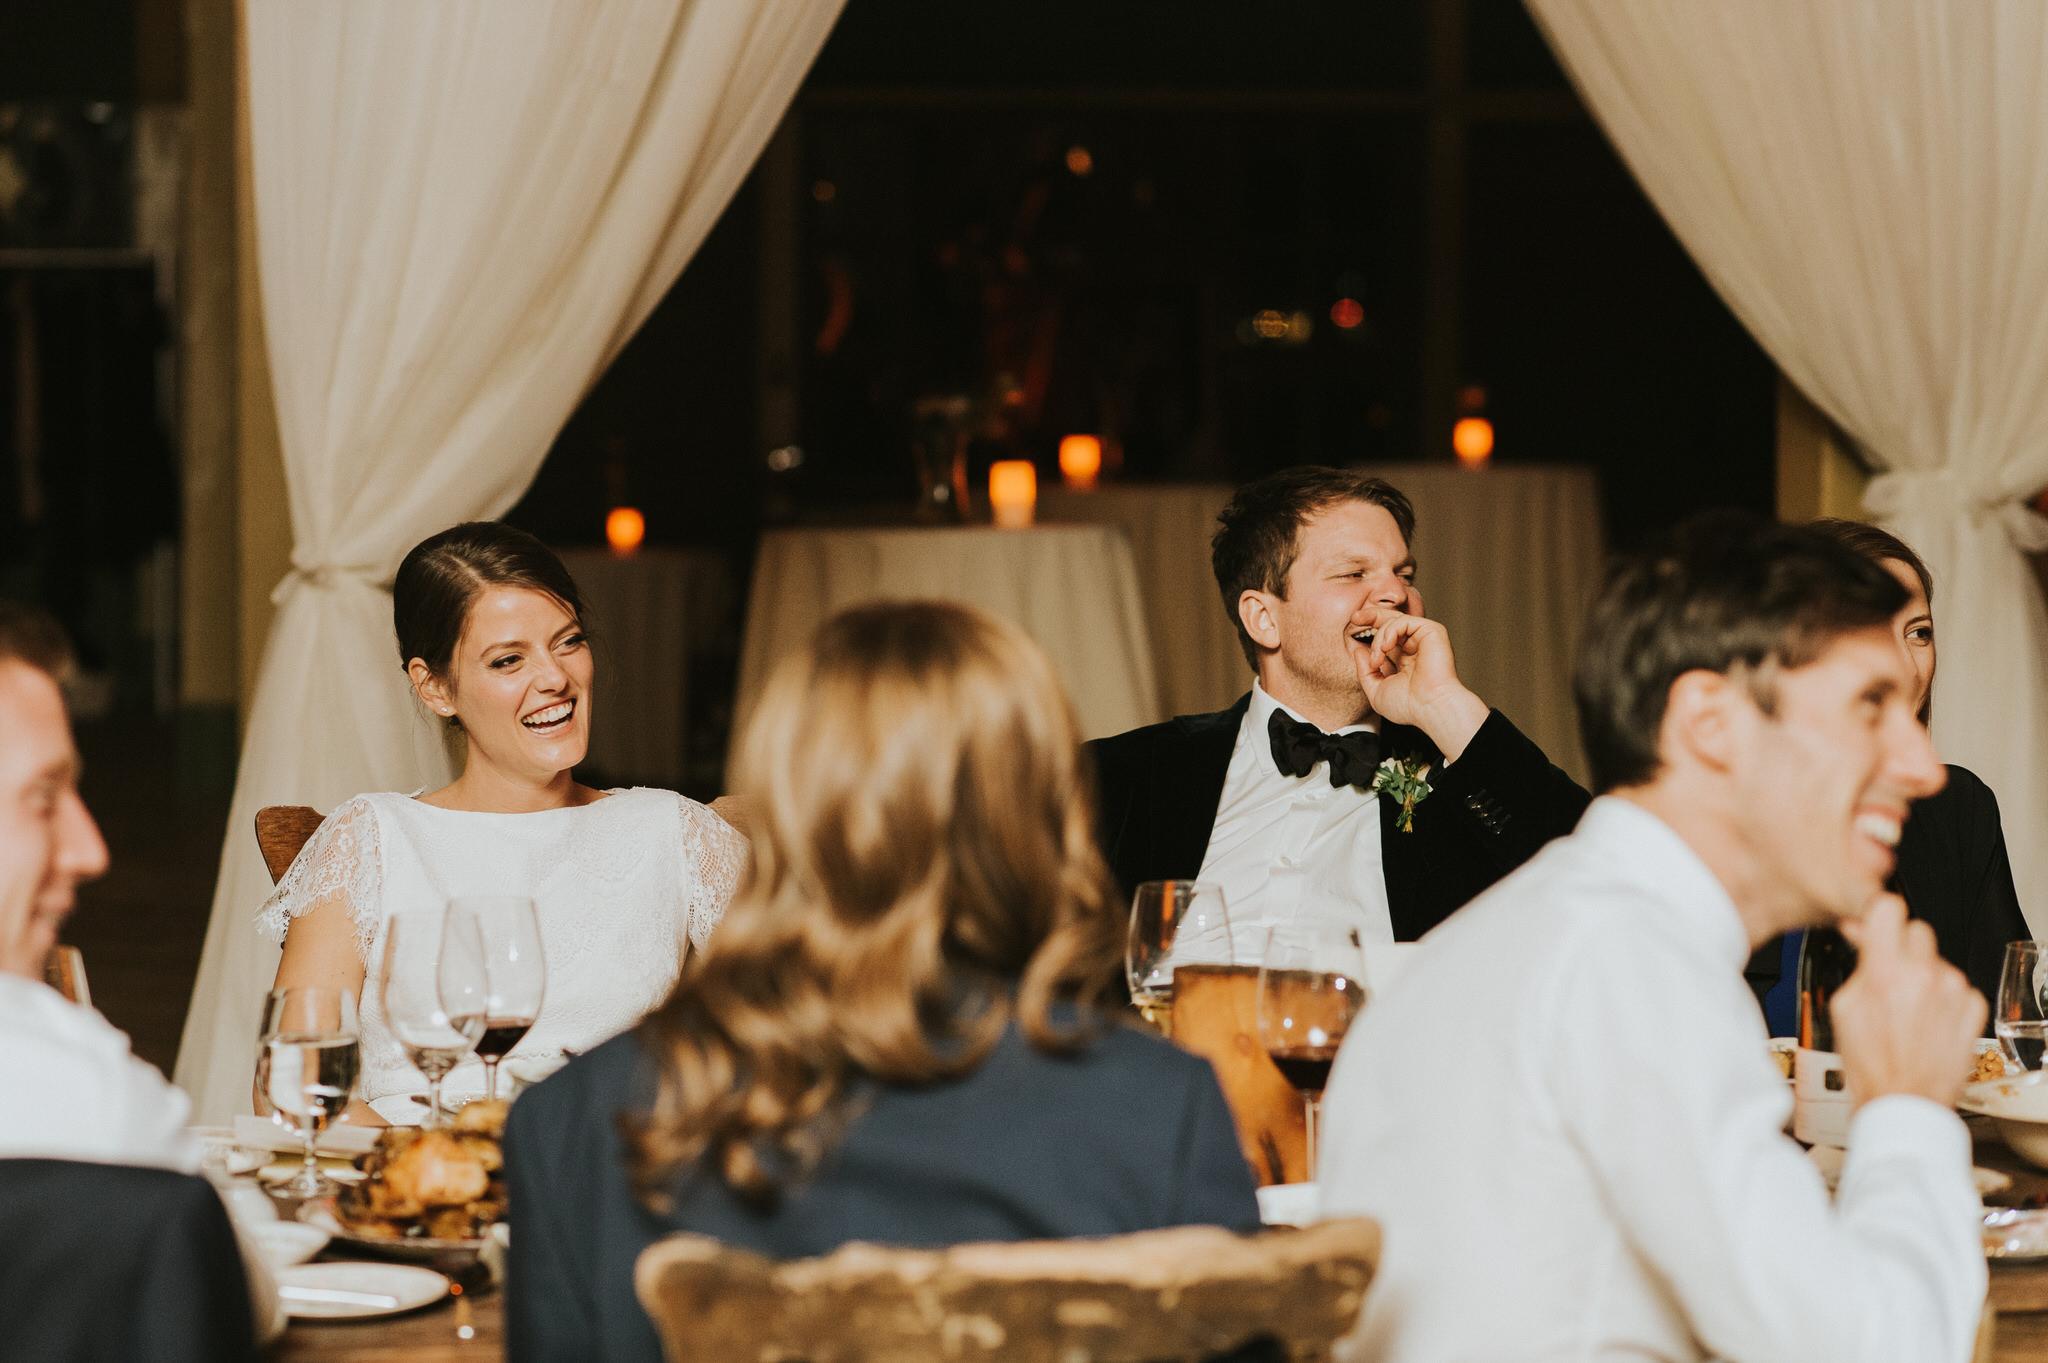 scarletoneillphotography_weddingphotography_prince edward county weddings160.JPG